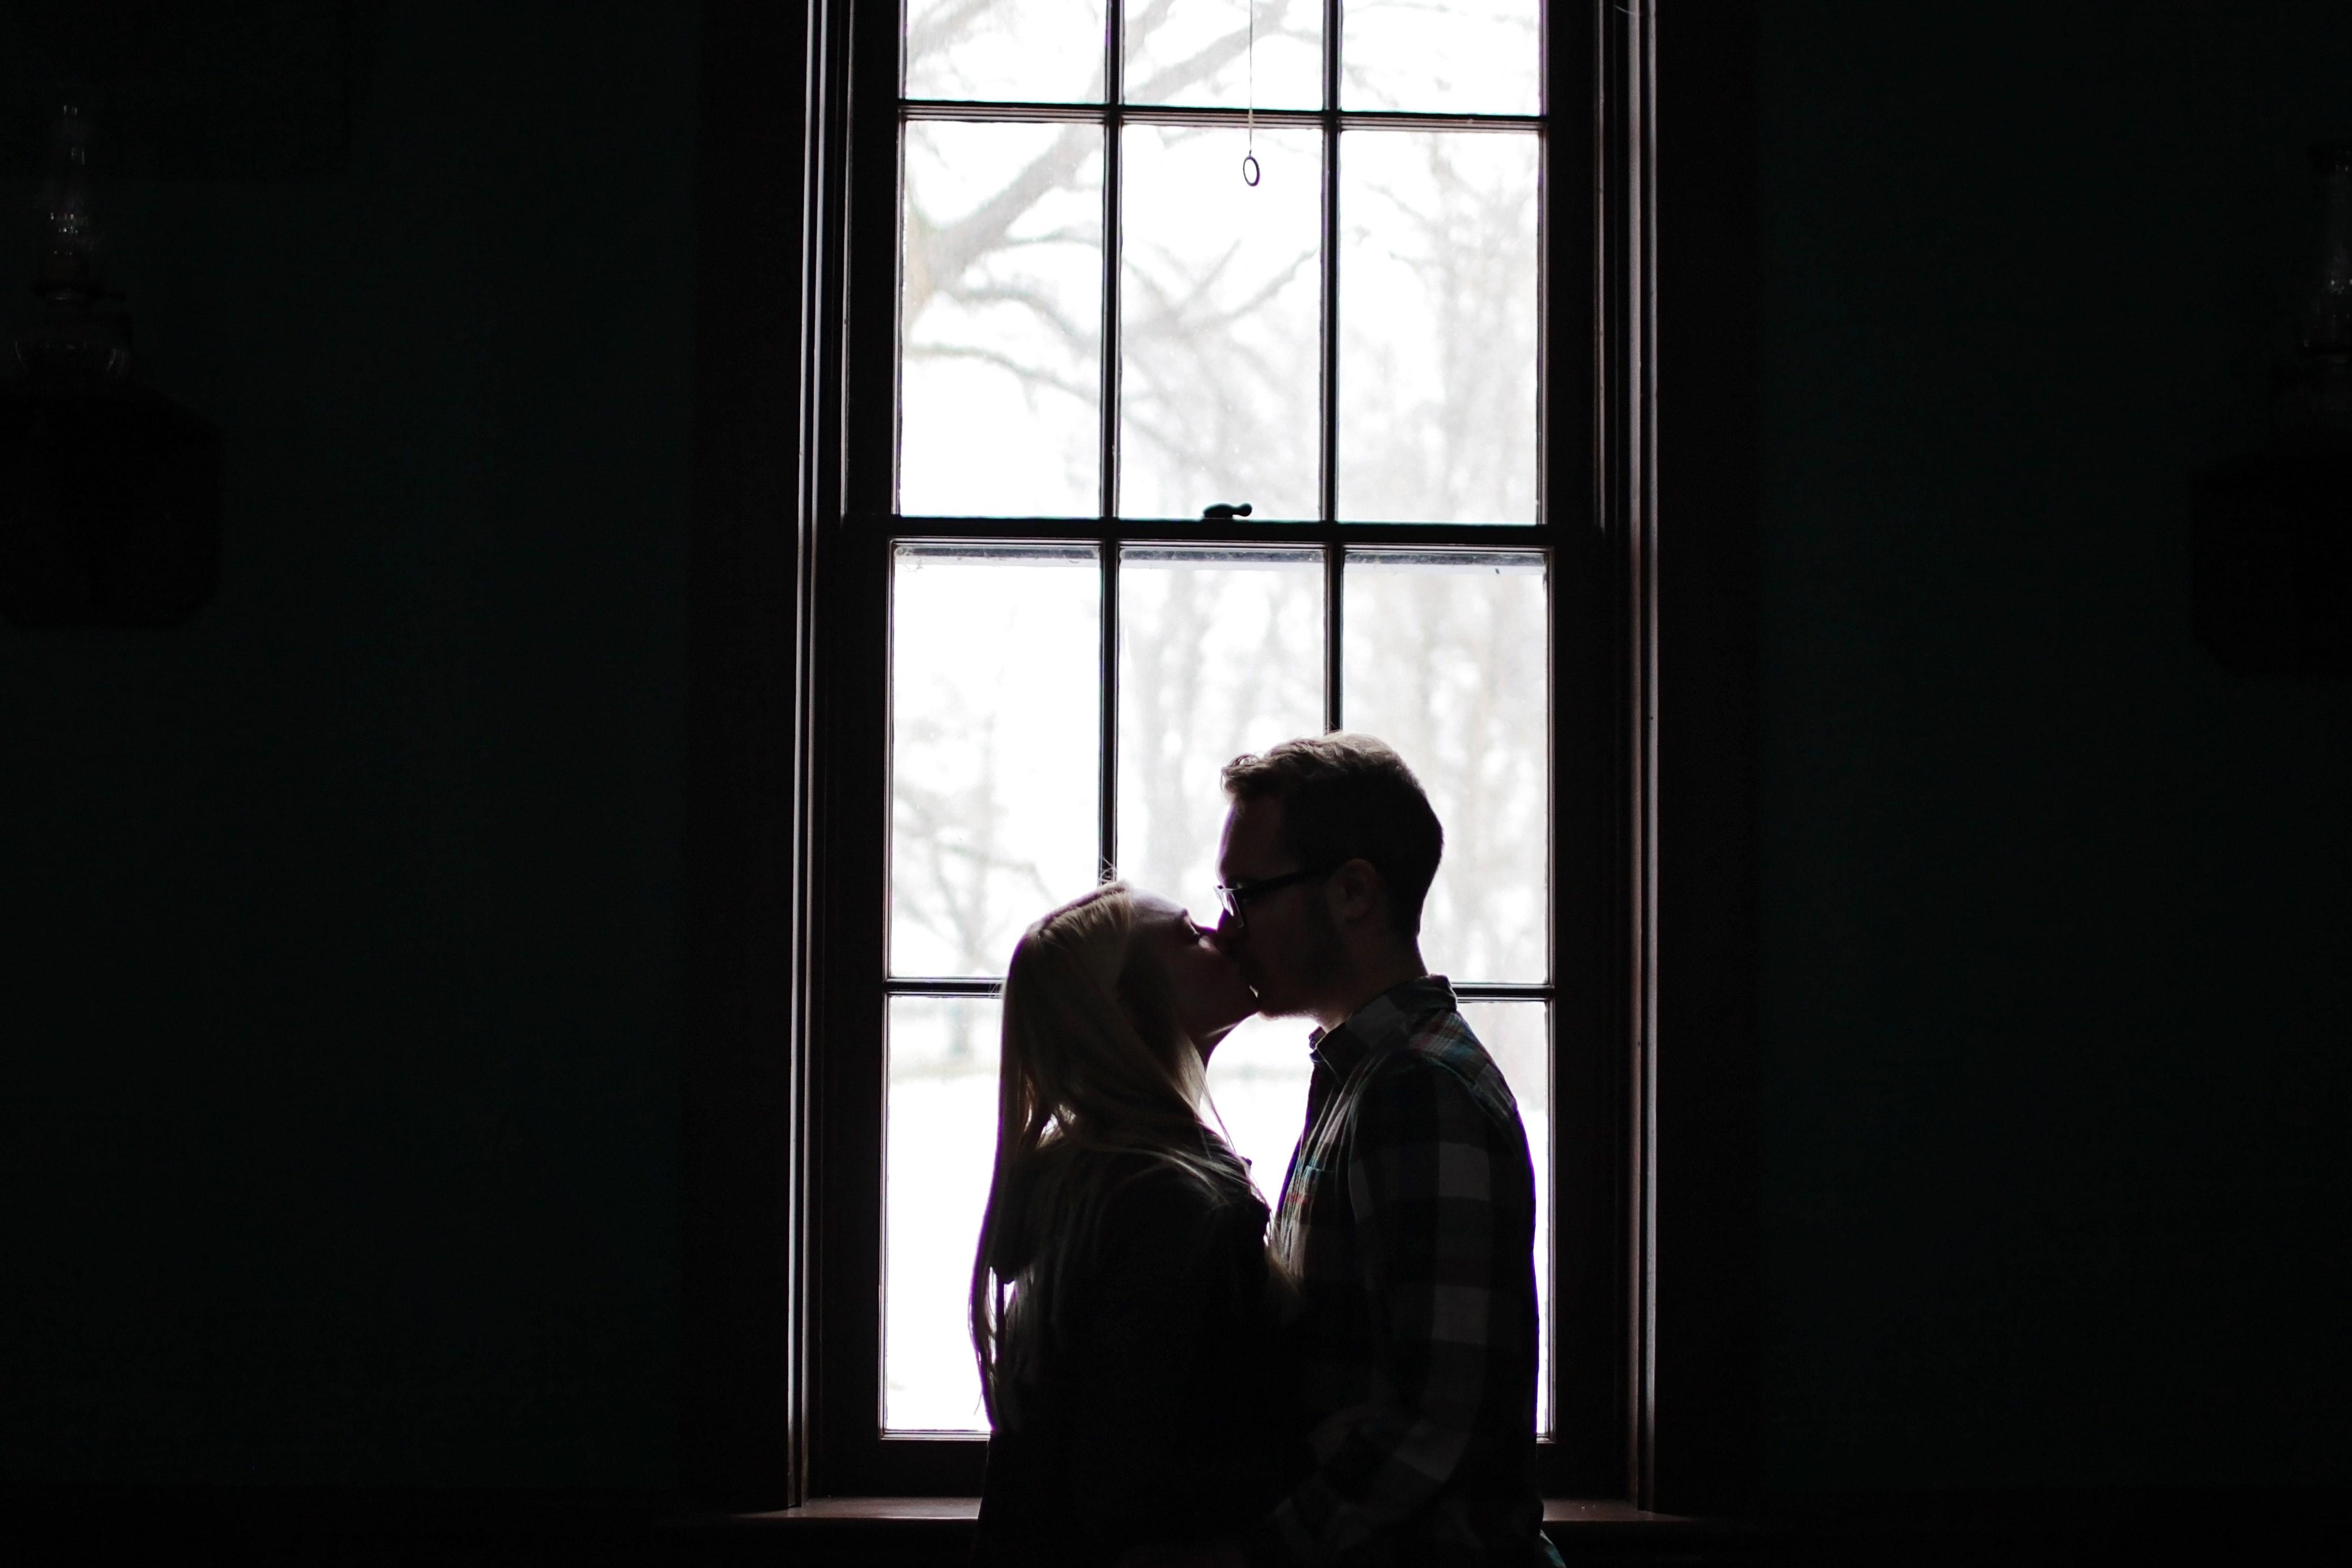 Man and Woman Kissing Beside Window, Affection, Love, Window, Wear, HQ Photo